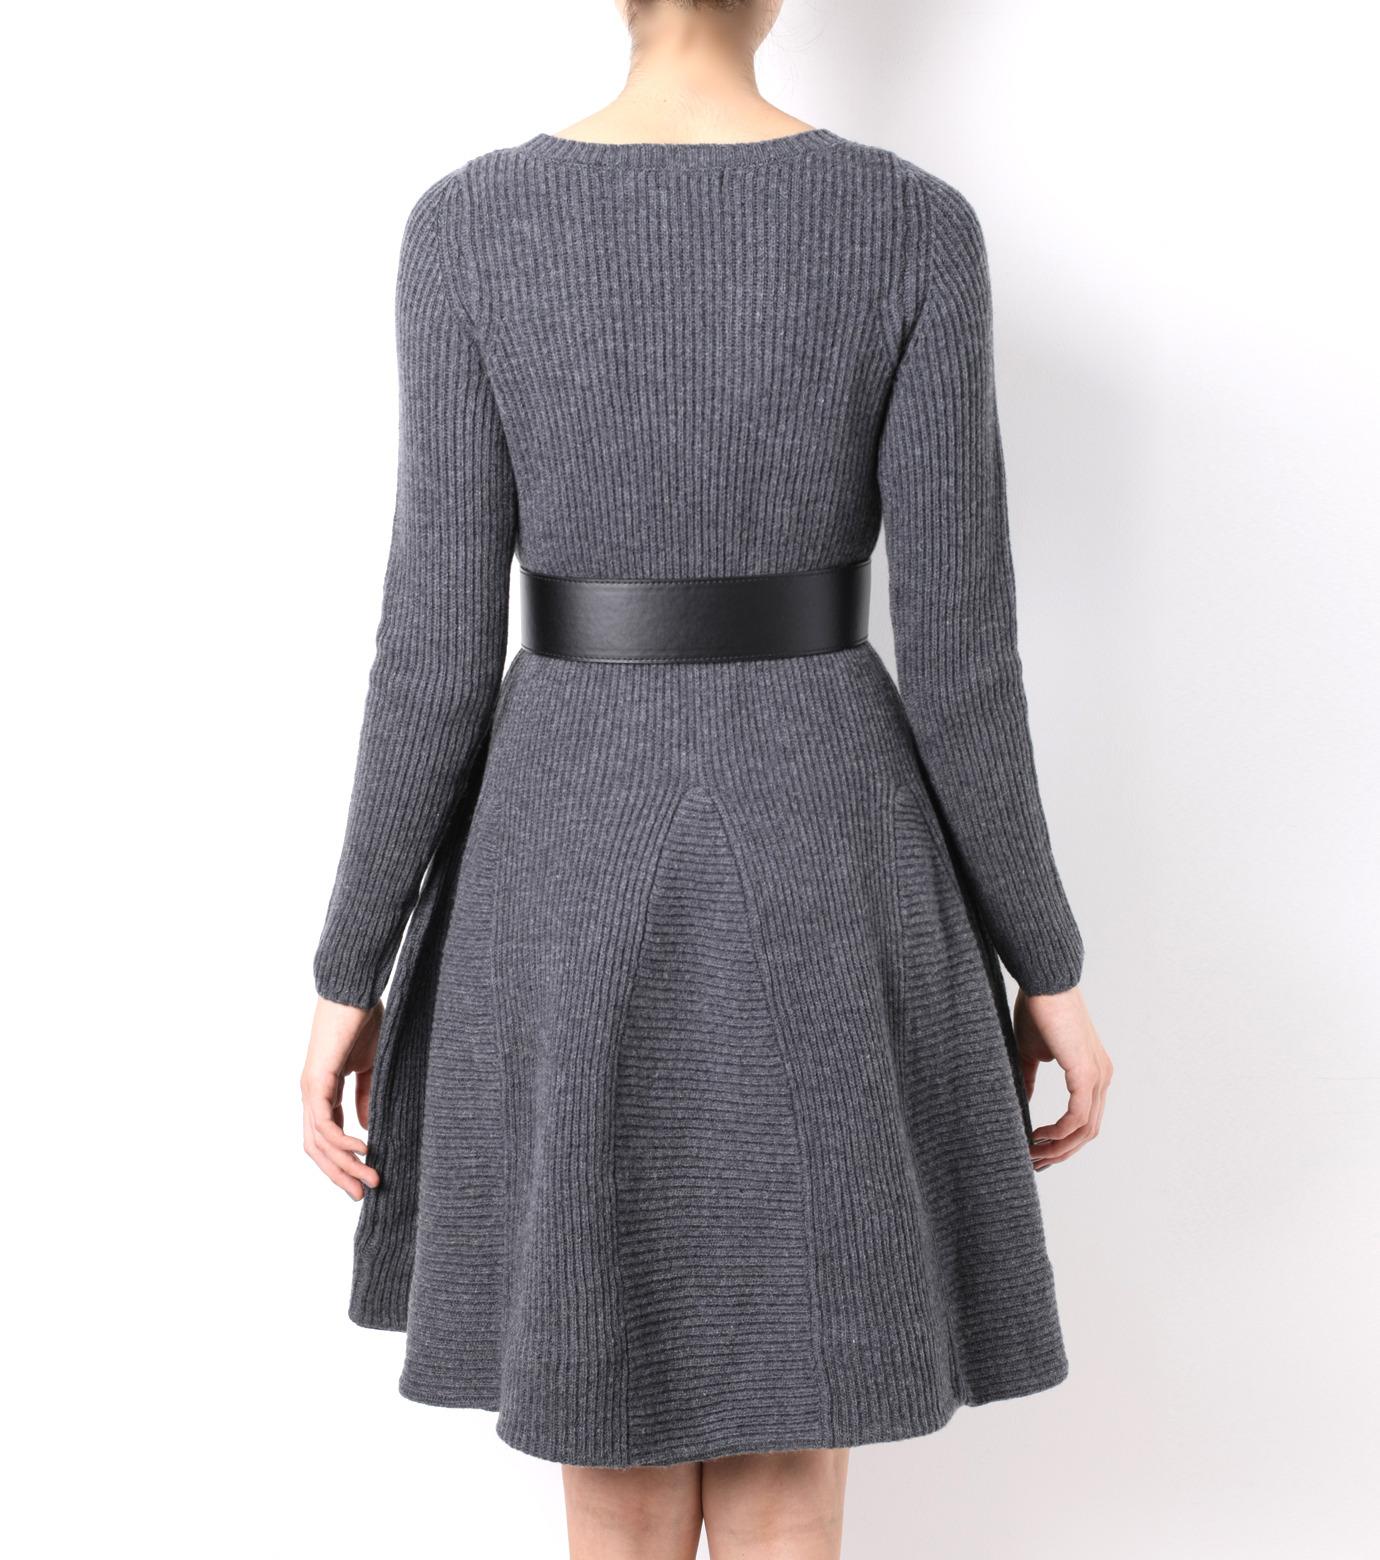 LE CIEL BLEU(ルシェルブルー)のRib Stitch Flare Crewneck Dress-GRAY-15A65025 拡大詳細画像3